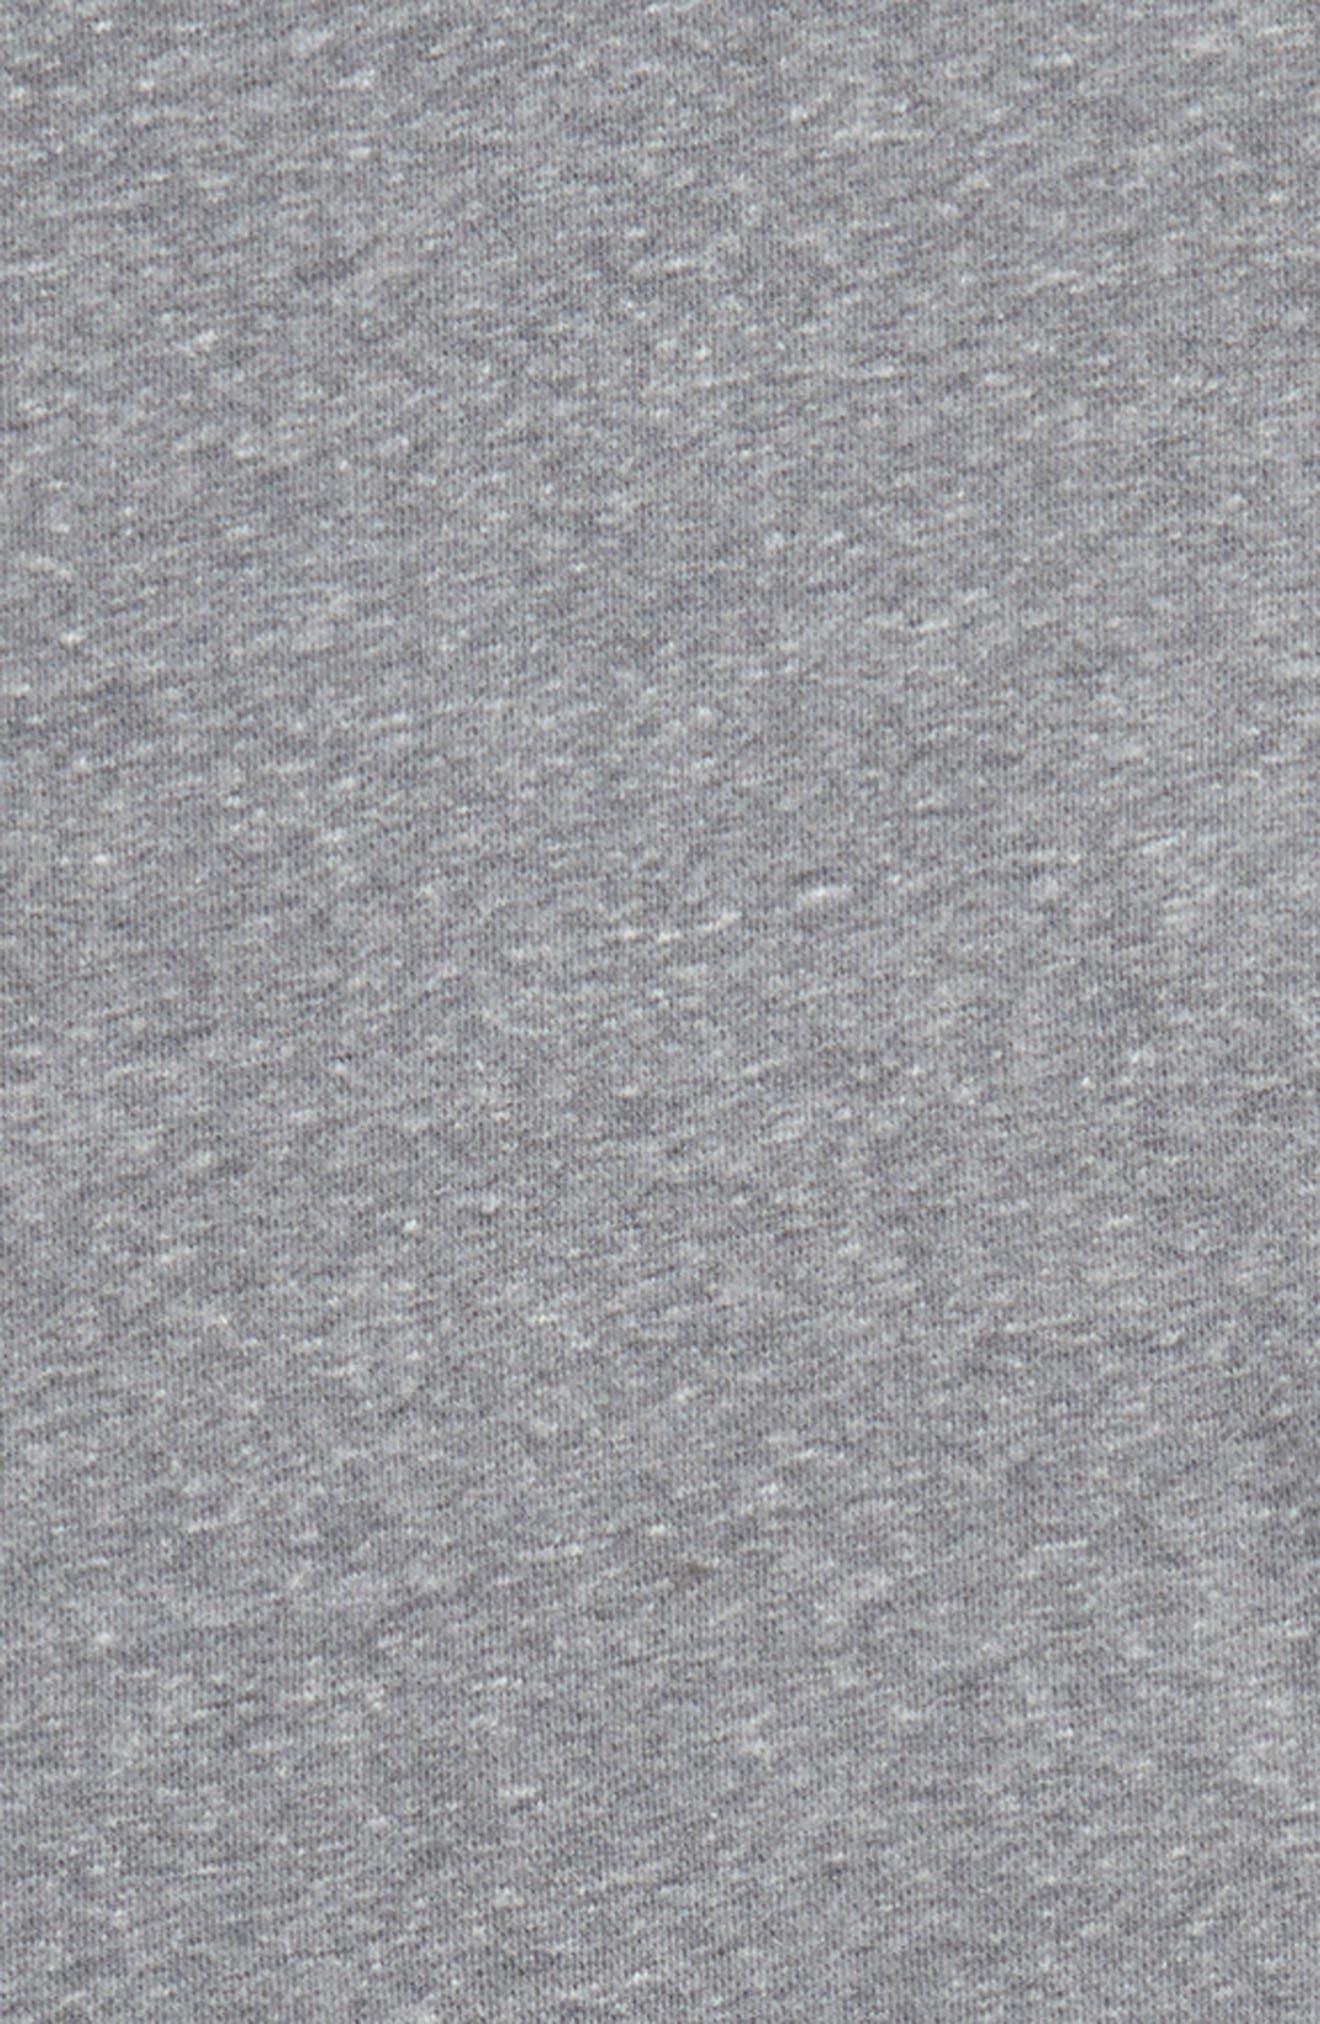 Hooded Short Sleeve Sweatshirt,                             Alternate thumbnail 2, color,                             Grey Medium Heather